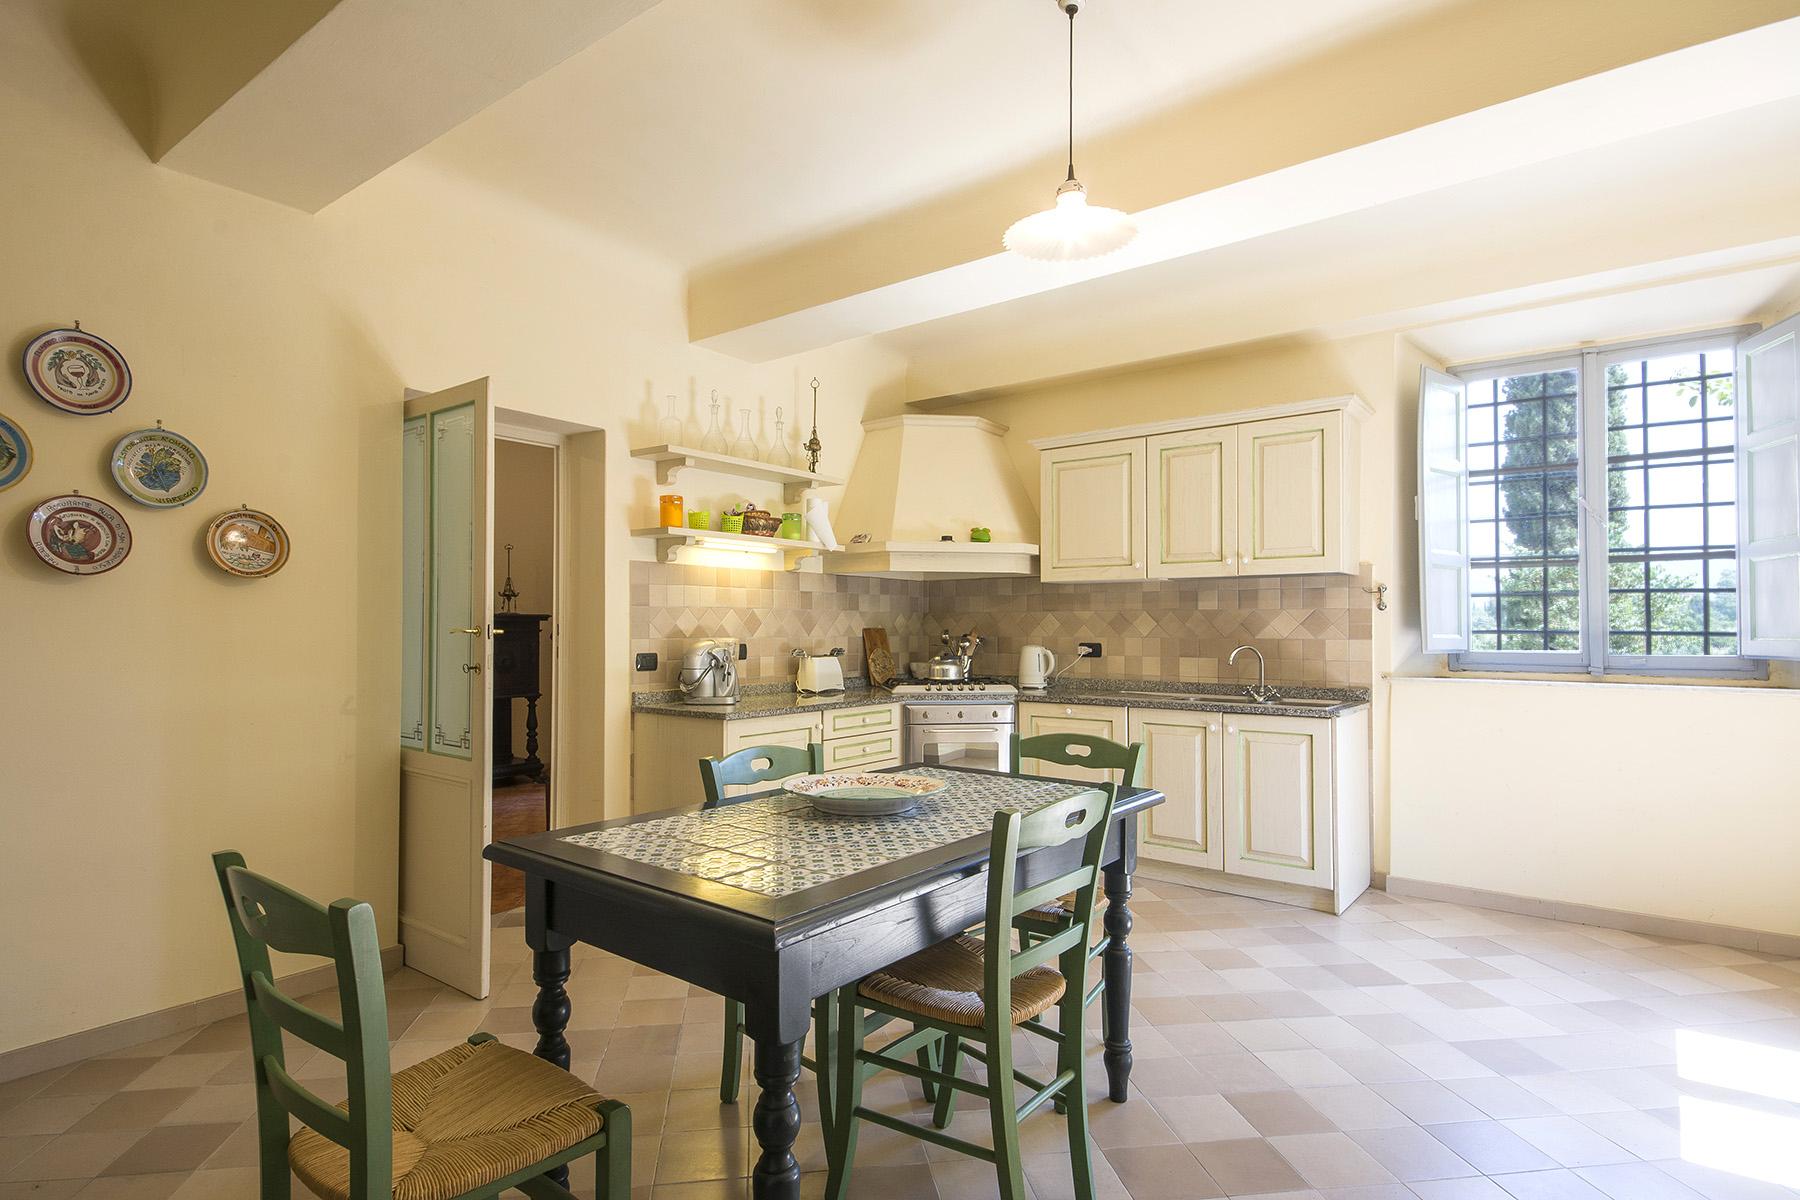 Villa in Vendita a Lucca: 5 locali, 1150 mq - Foto 8